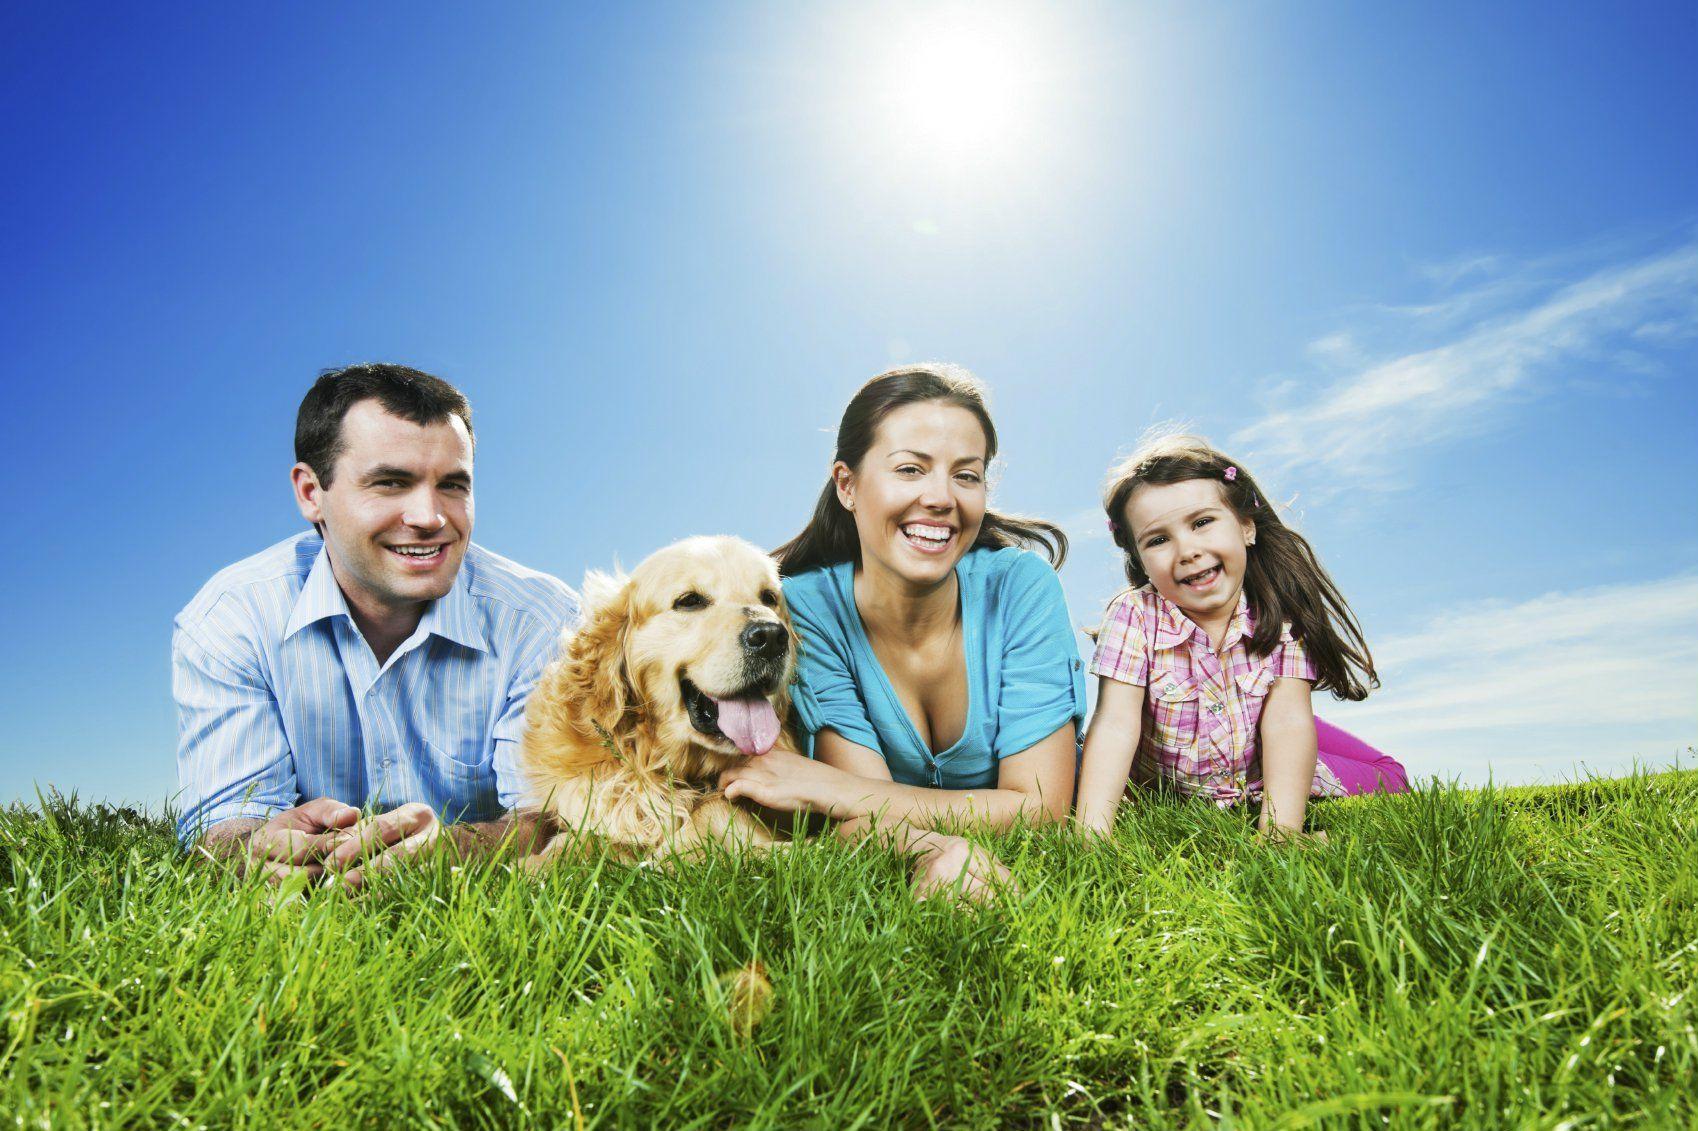 101-happy-family